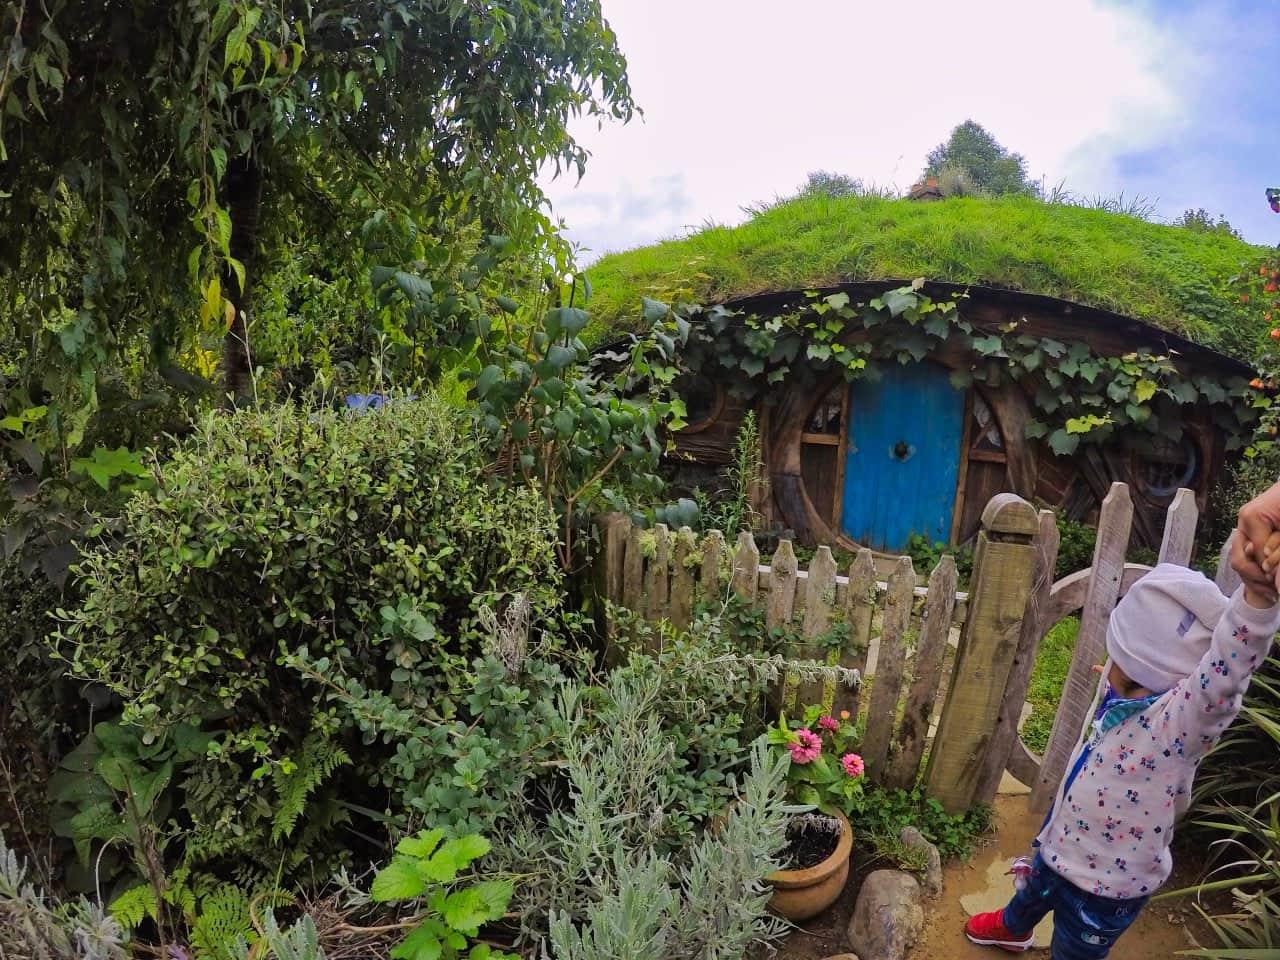 Hobbiton-Movie-Set-House-blue-Door-Tabea